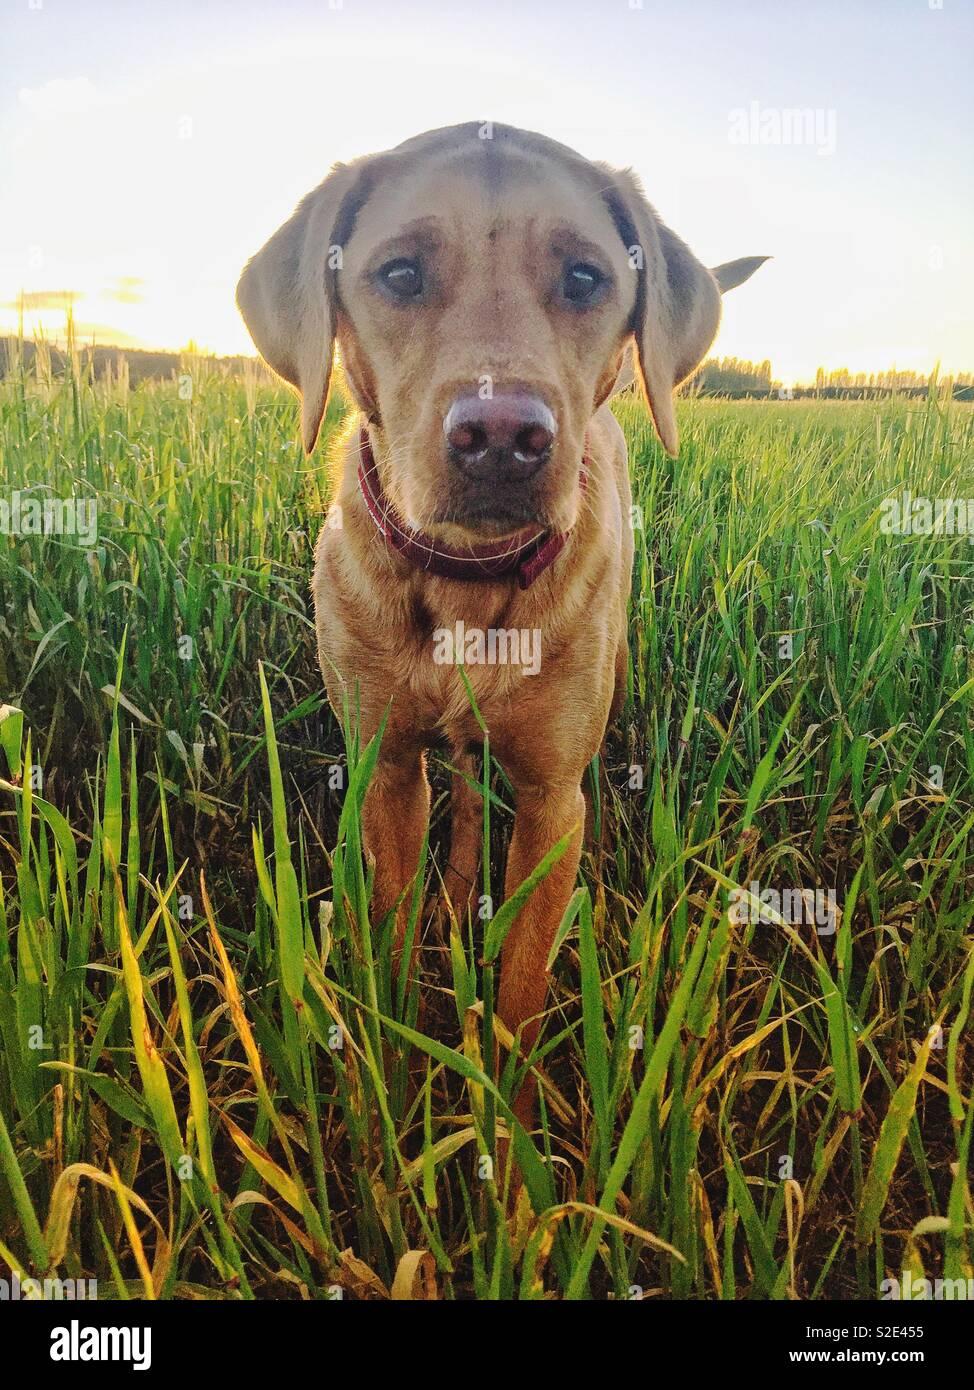 A yellow Labrador retriever gun dog standing in a grassy field - Stock Image